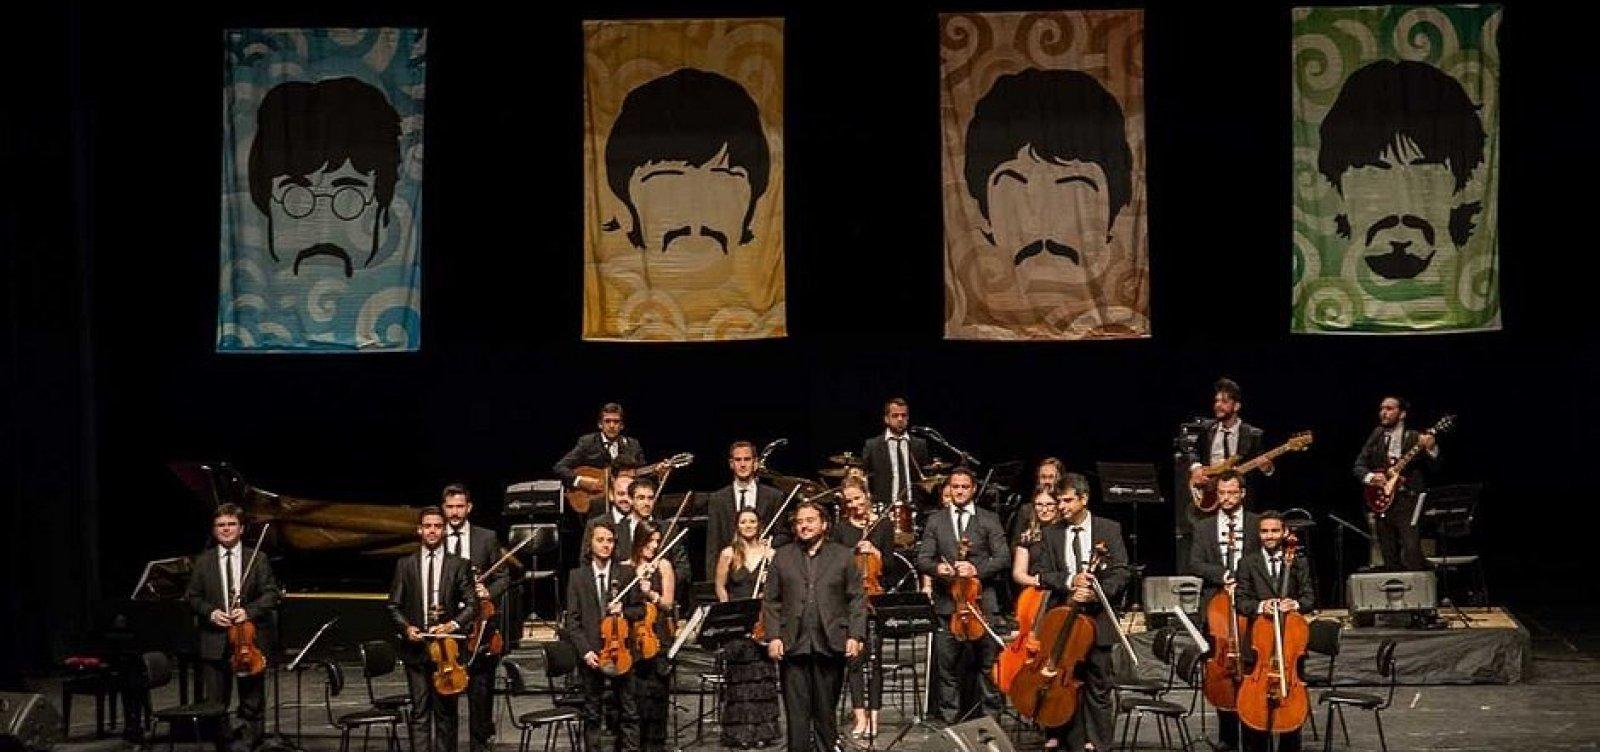 Orquestra Ouro Preto traz espetáculo The Beatles para Salvador